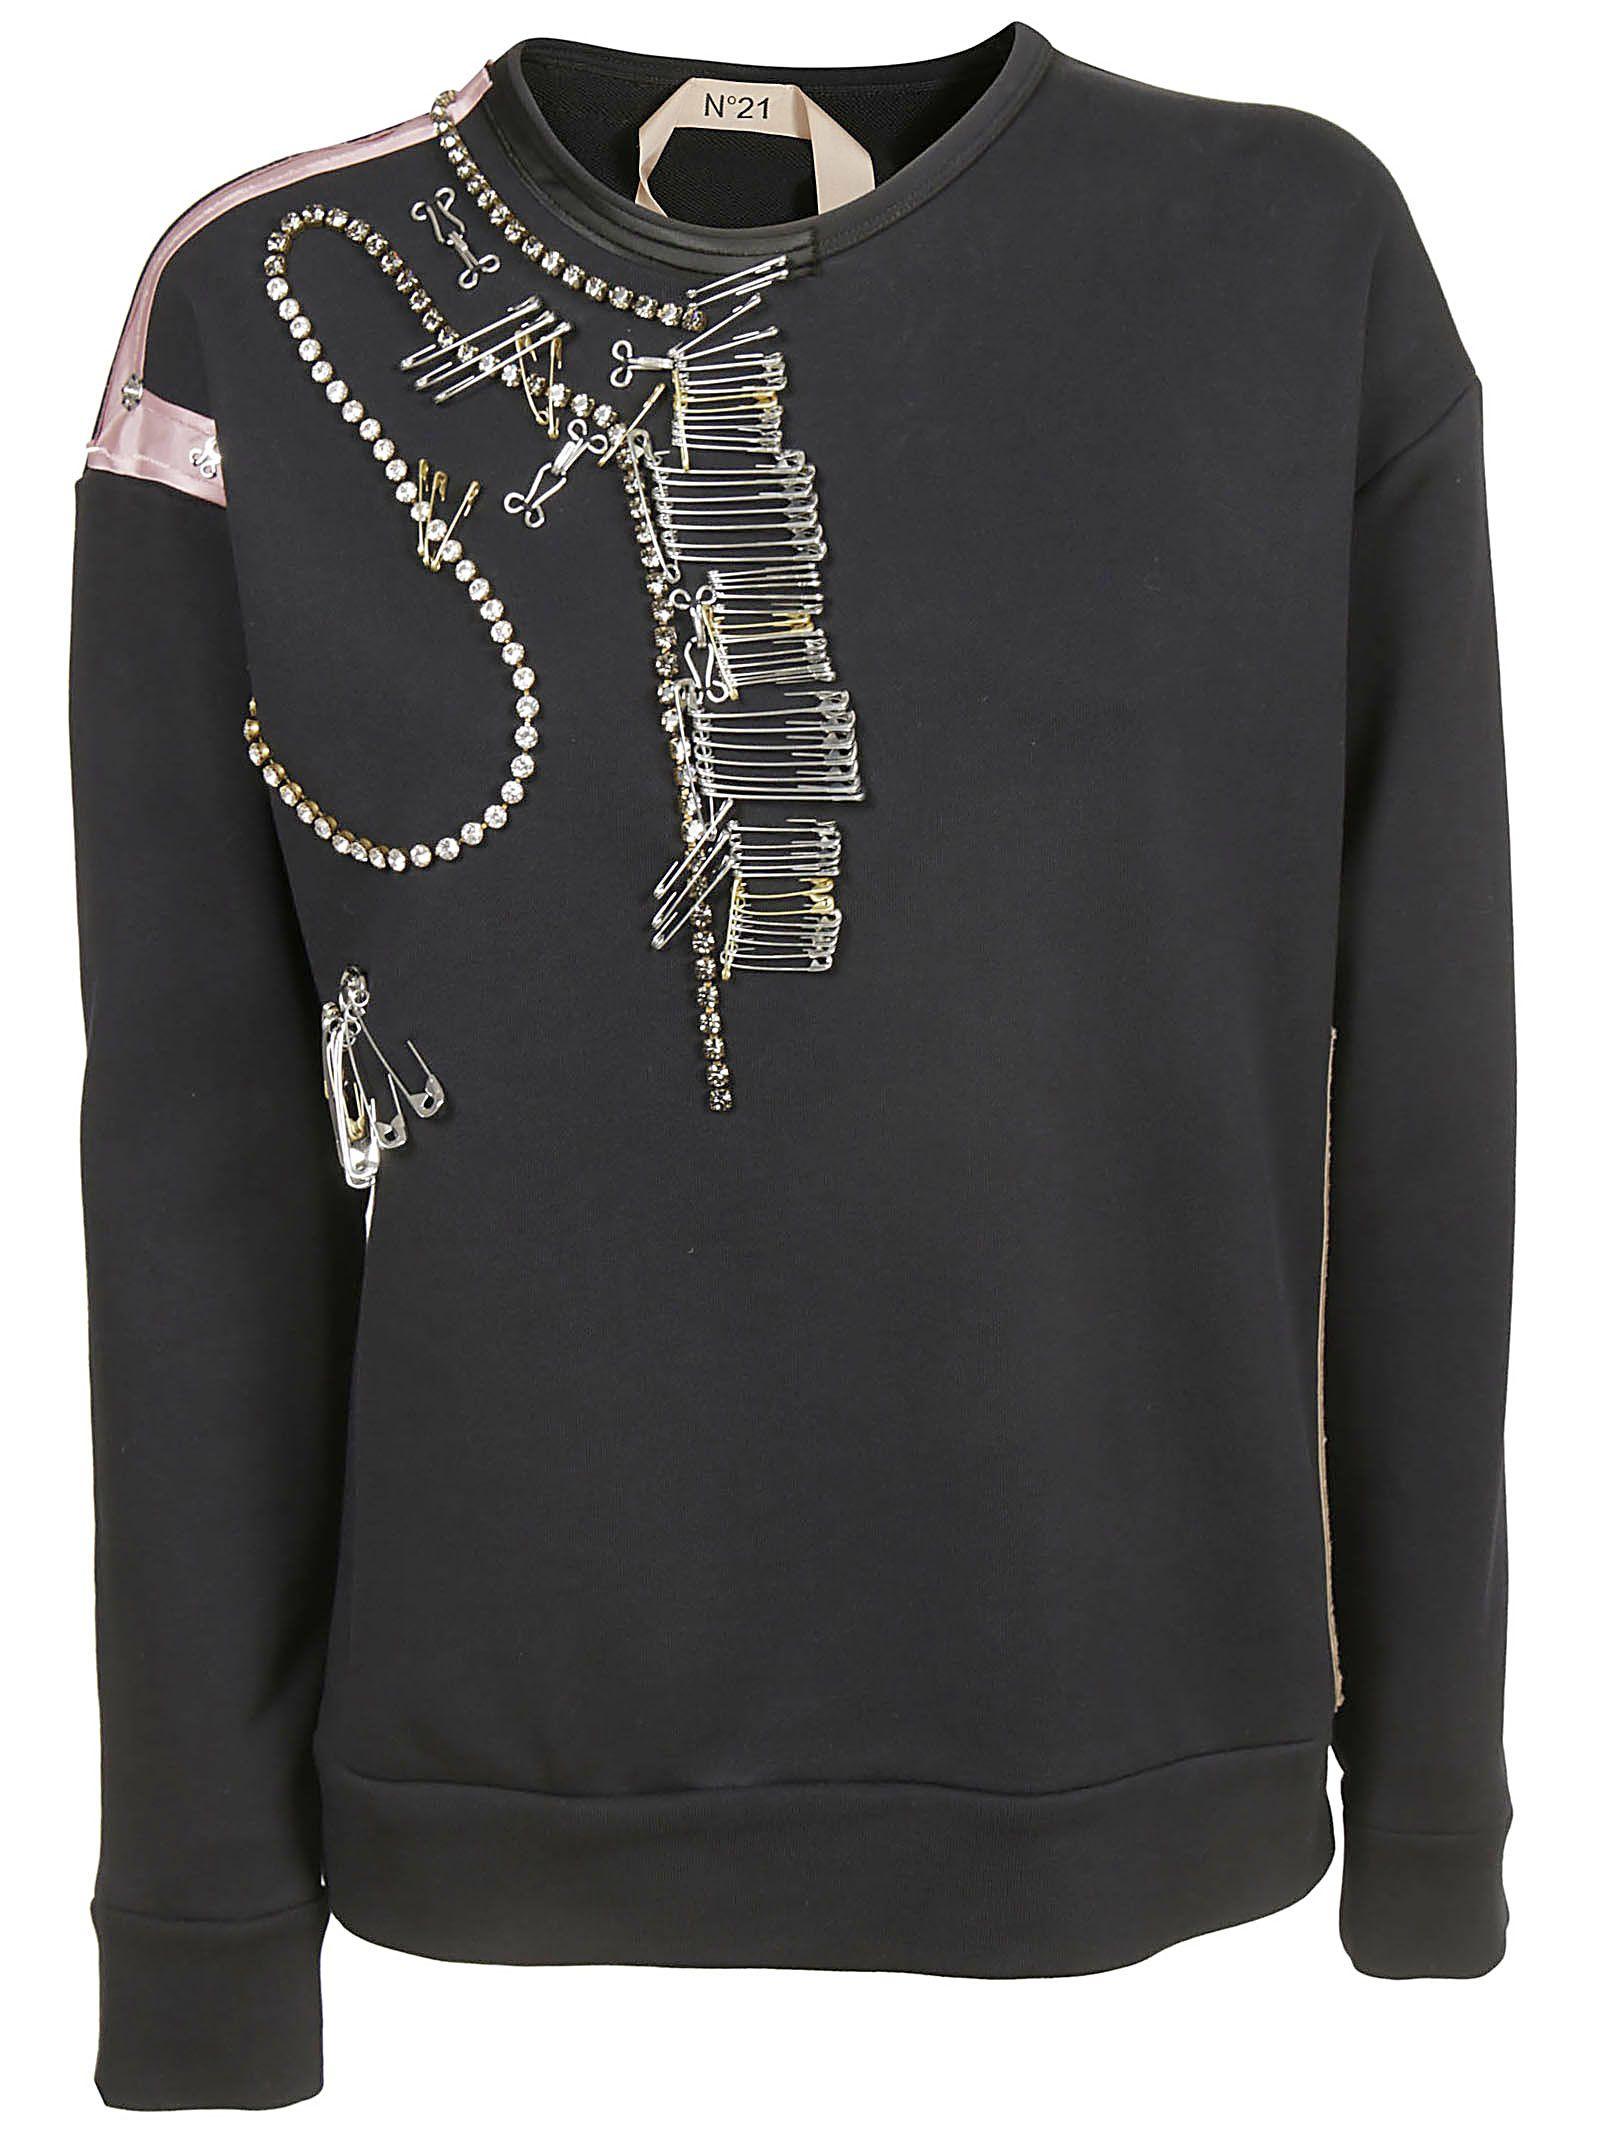 N.21 Embellished Sweatshirt